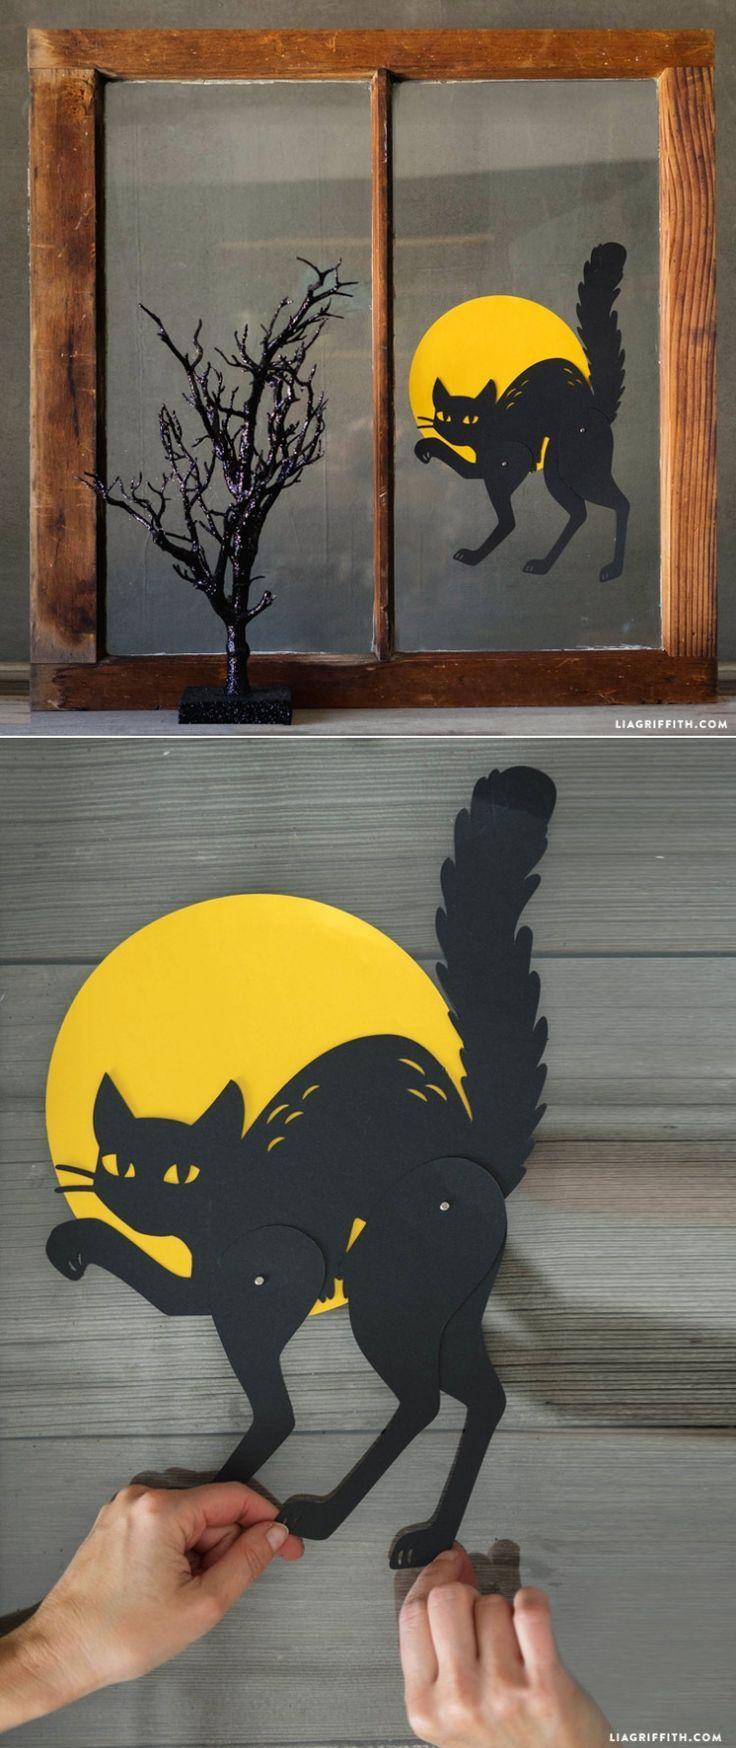 Halloween Papercut Paperart Diyhalloween Halloweendecorations Www Liagriffith Com Halloween Art Black Cat Halloween Halloween Cat